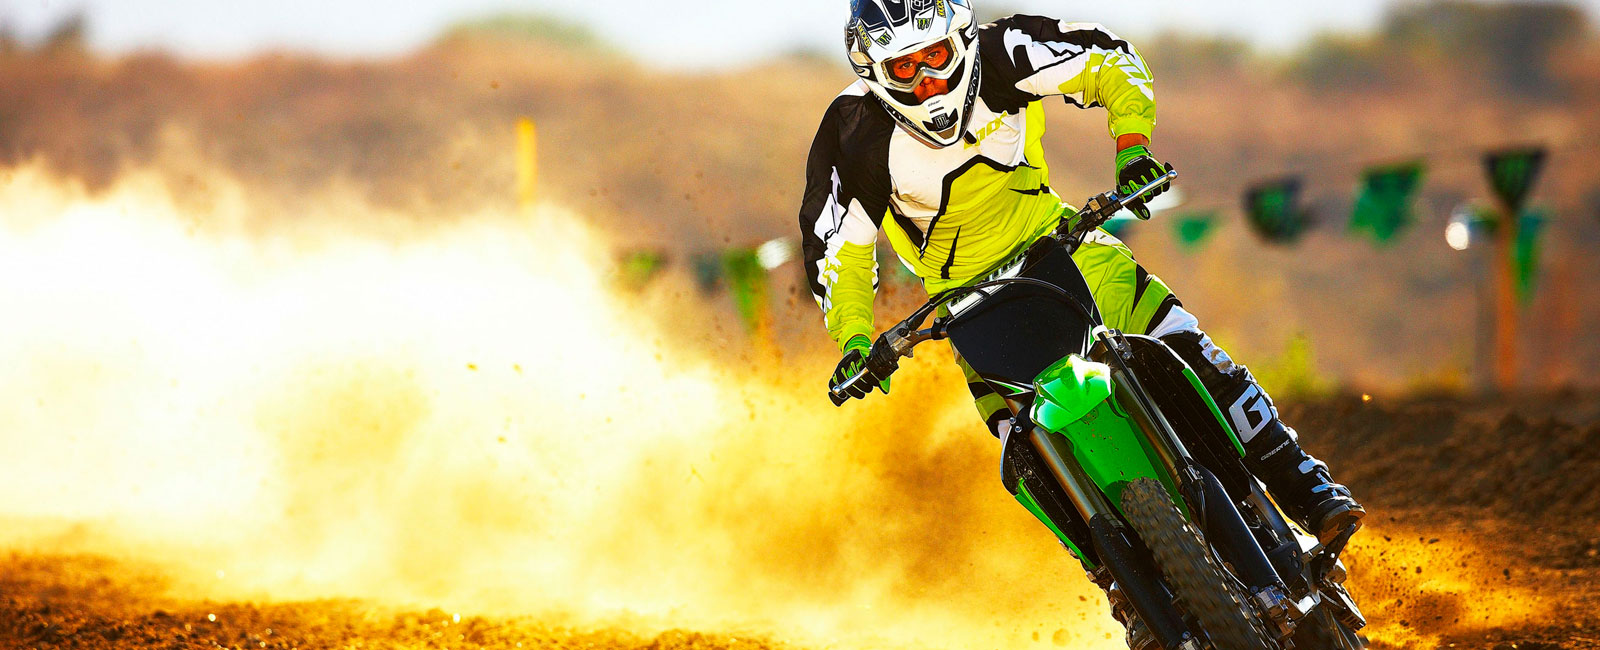 Rhino Goo Motocross